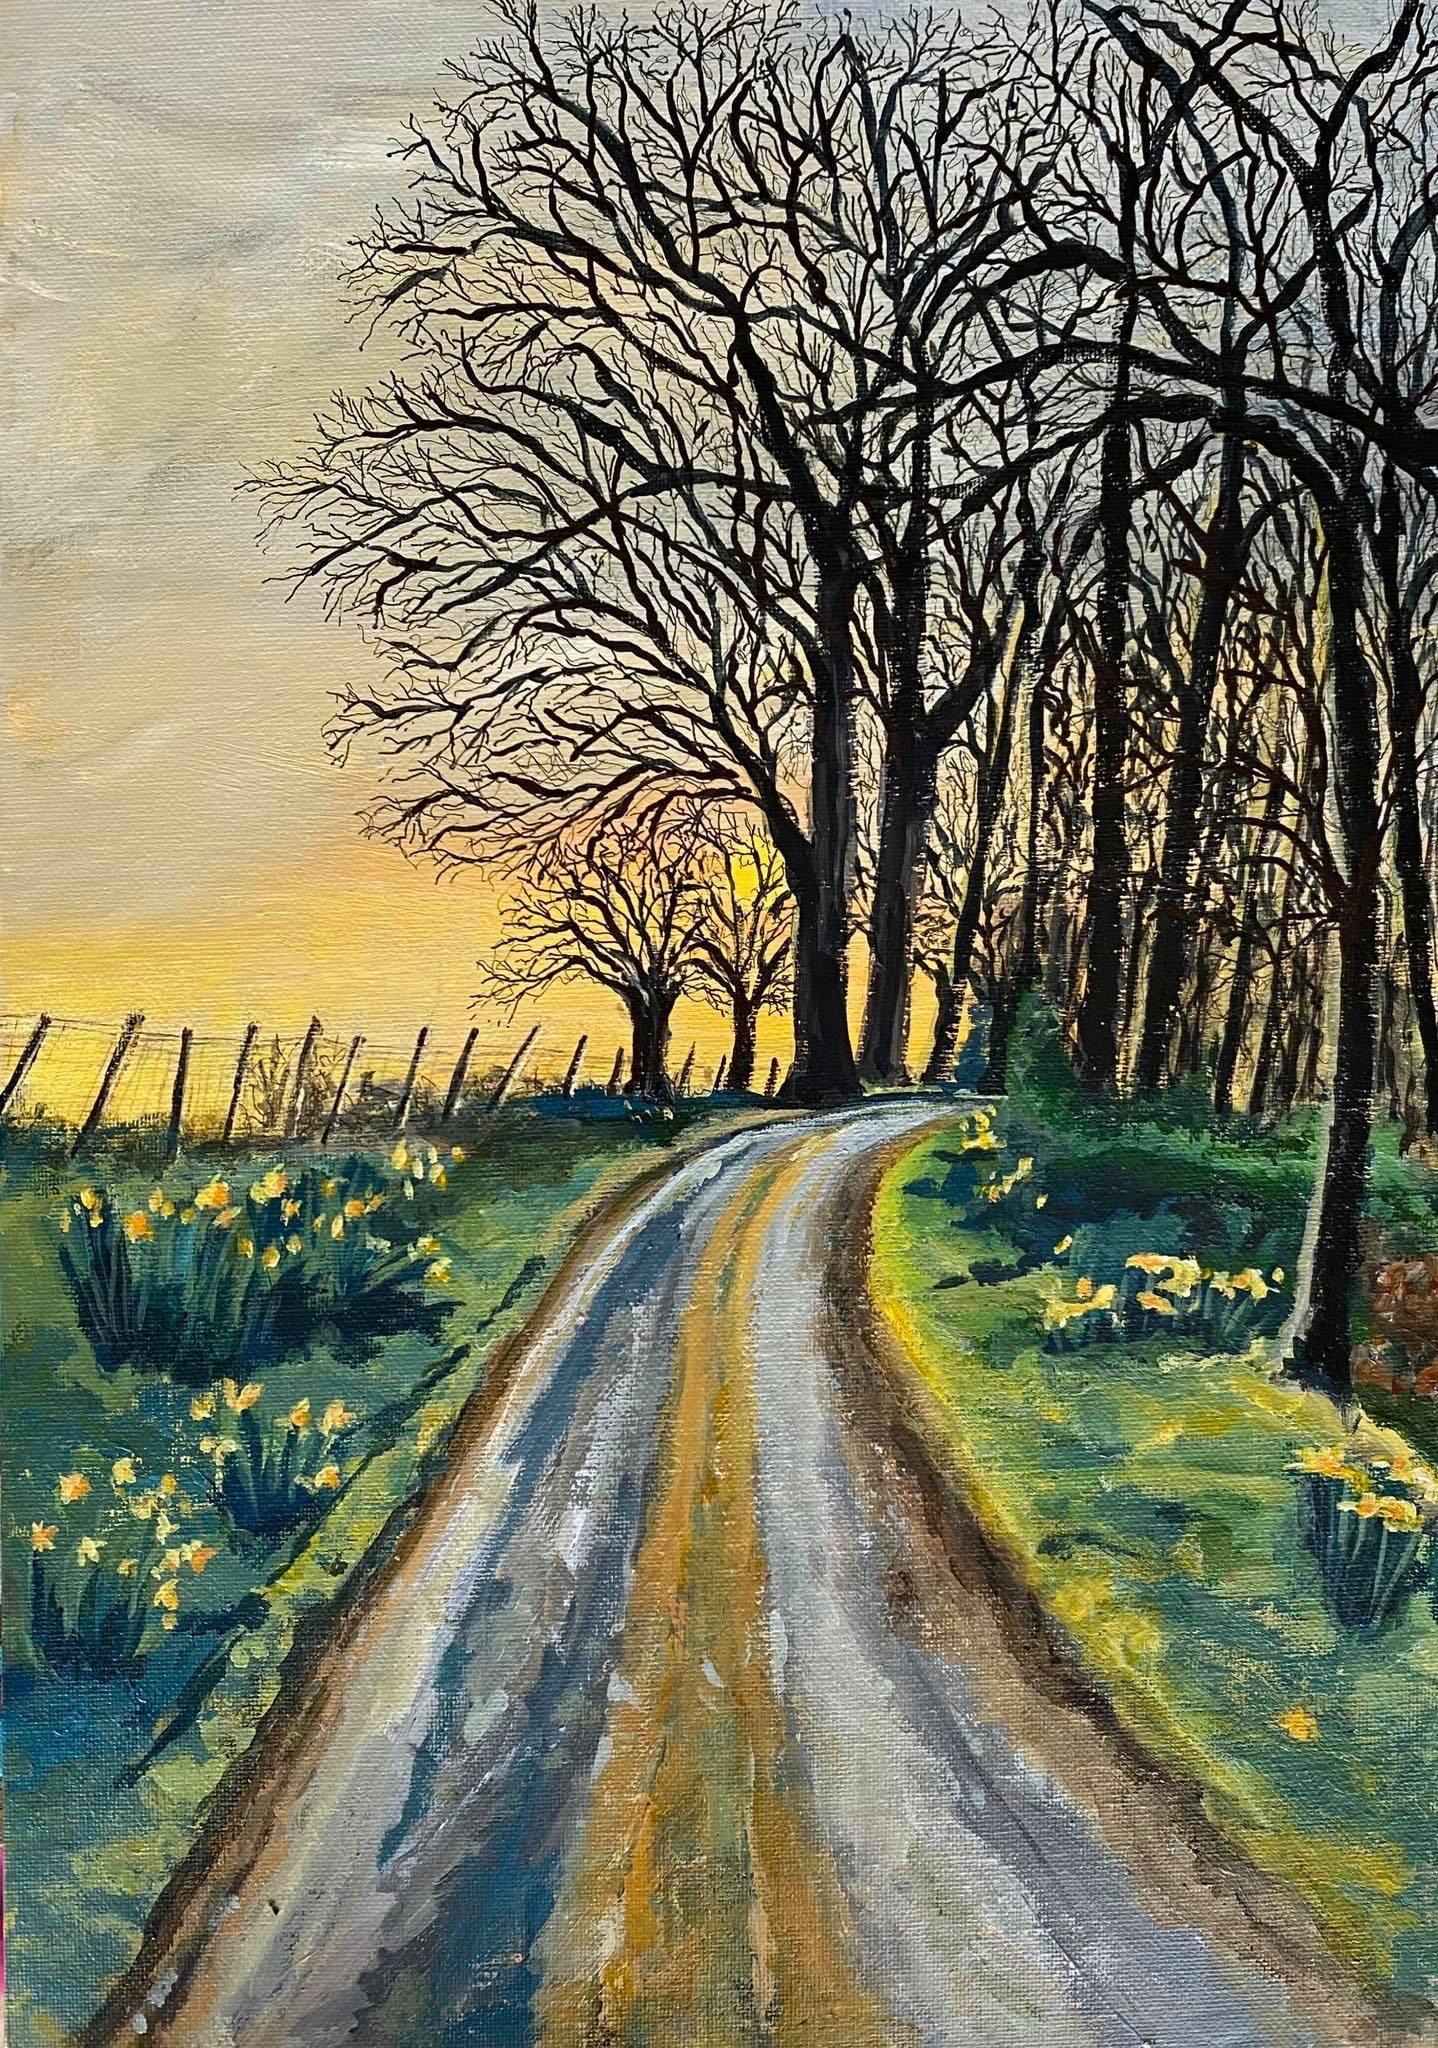 Sunset & Silhouette by Deborah Copeland.